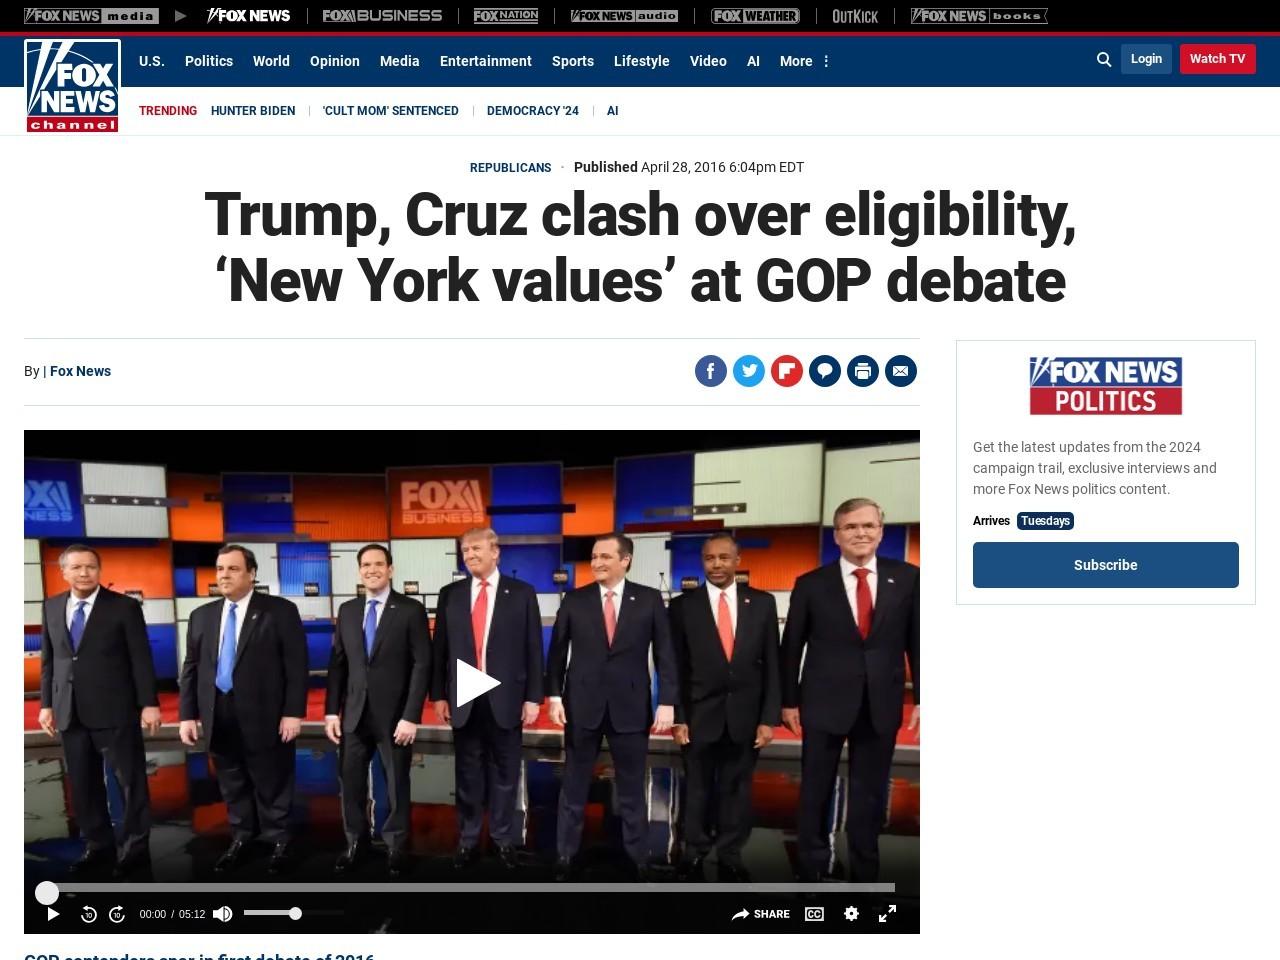 'I WAS BORN HERE'   Trump, Cruz clash over eligibility, 'New York values' at GOP debate